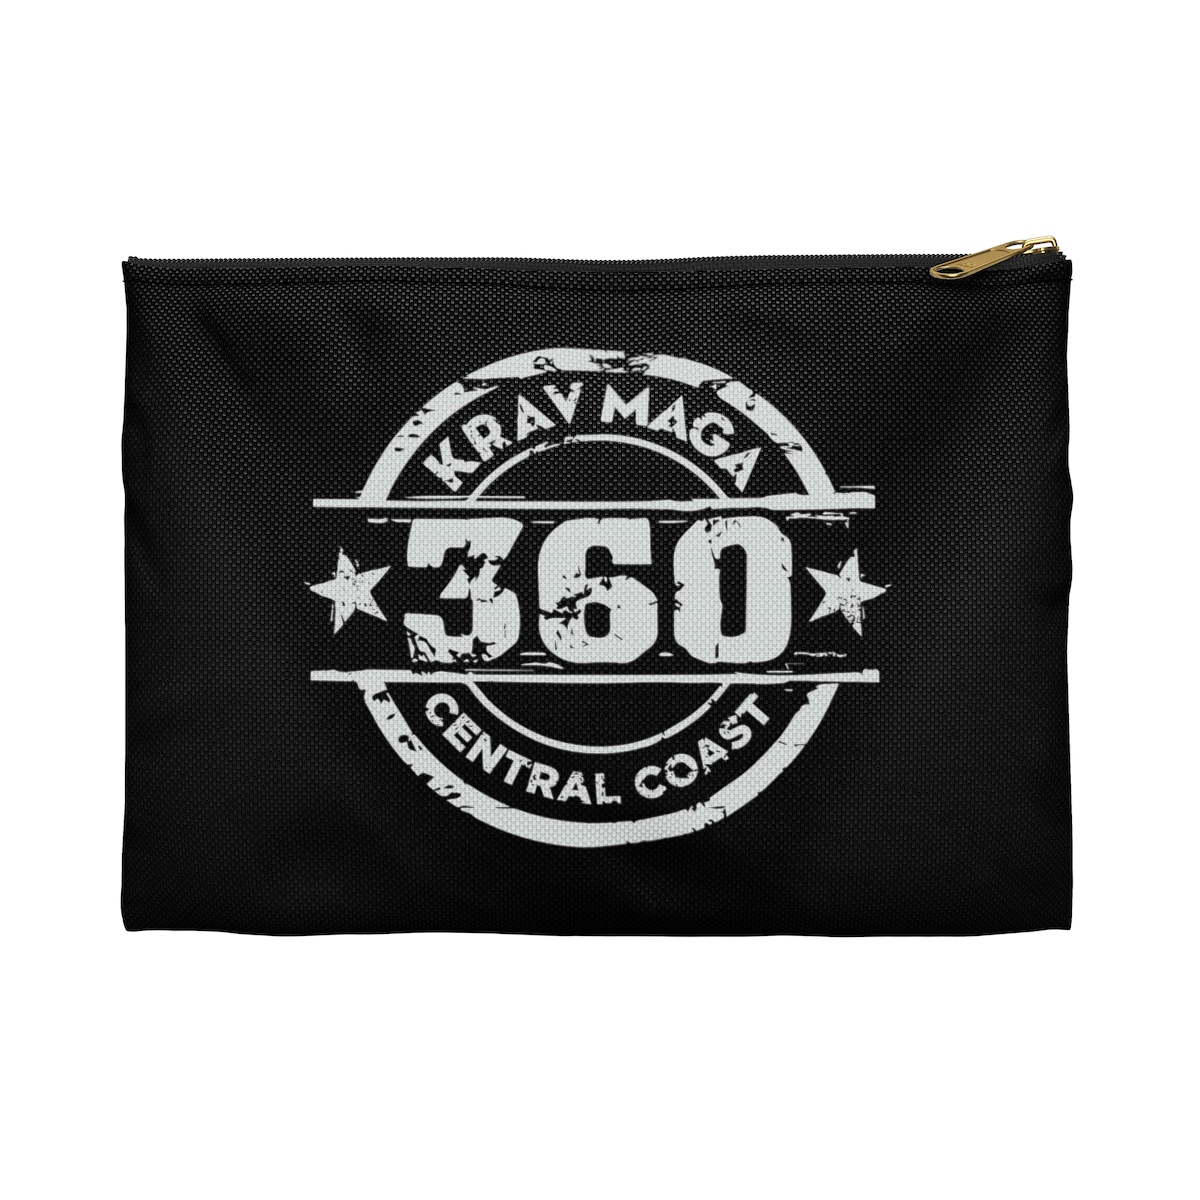 360 Krav Maga Central Coast Accessory Pouch